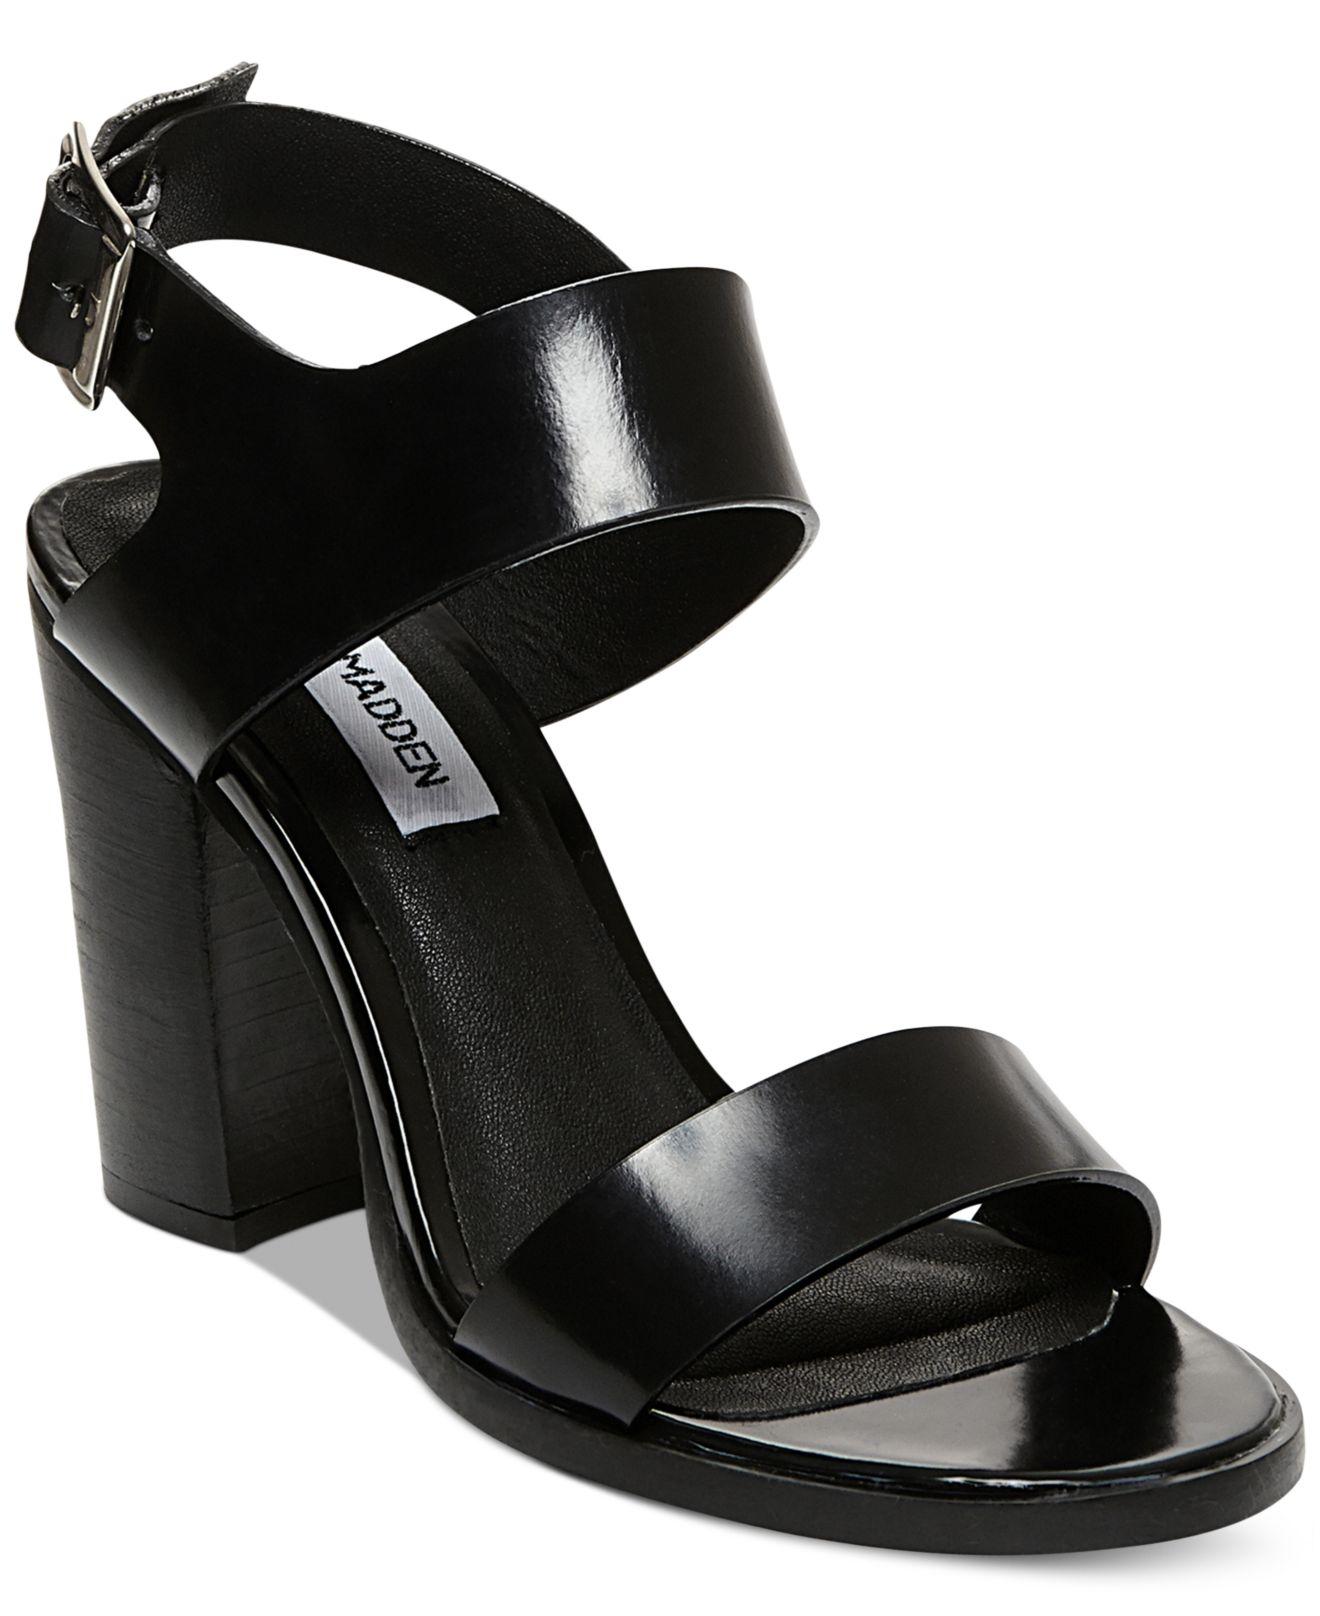 7b026b13cc7 Lyst Steve Madden Women S Blaair Block Heel Sandals In Black